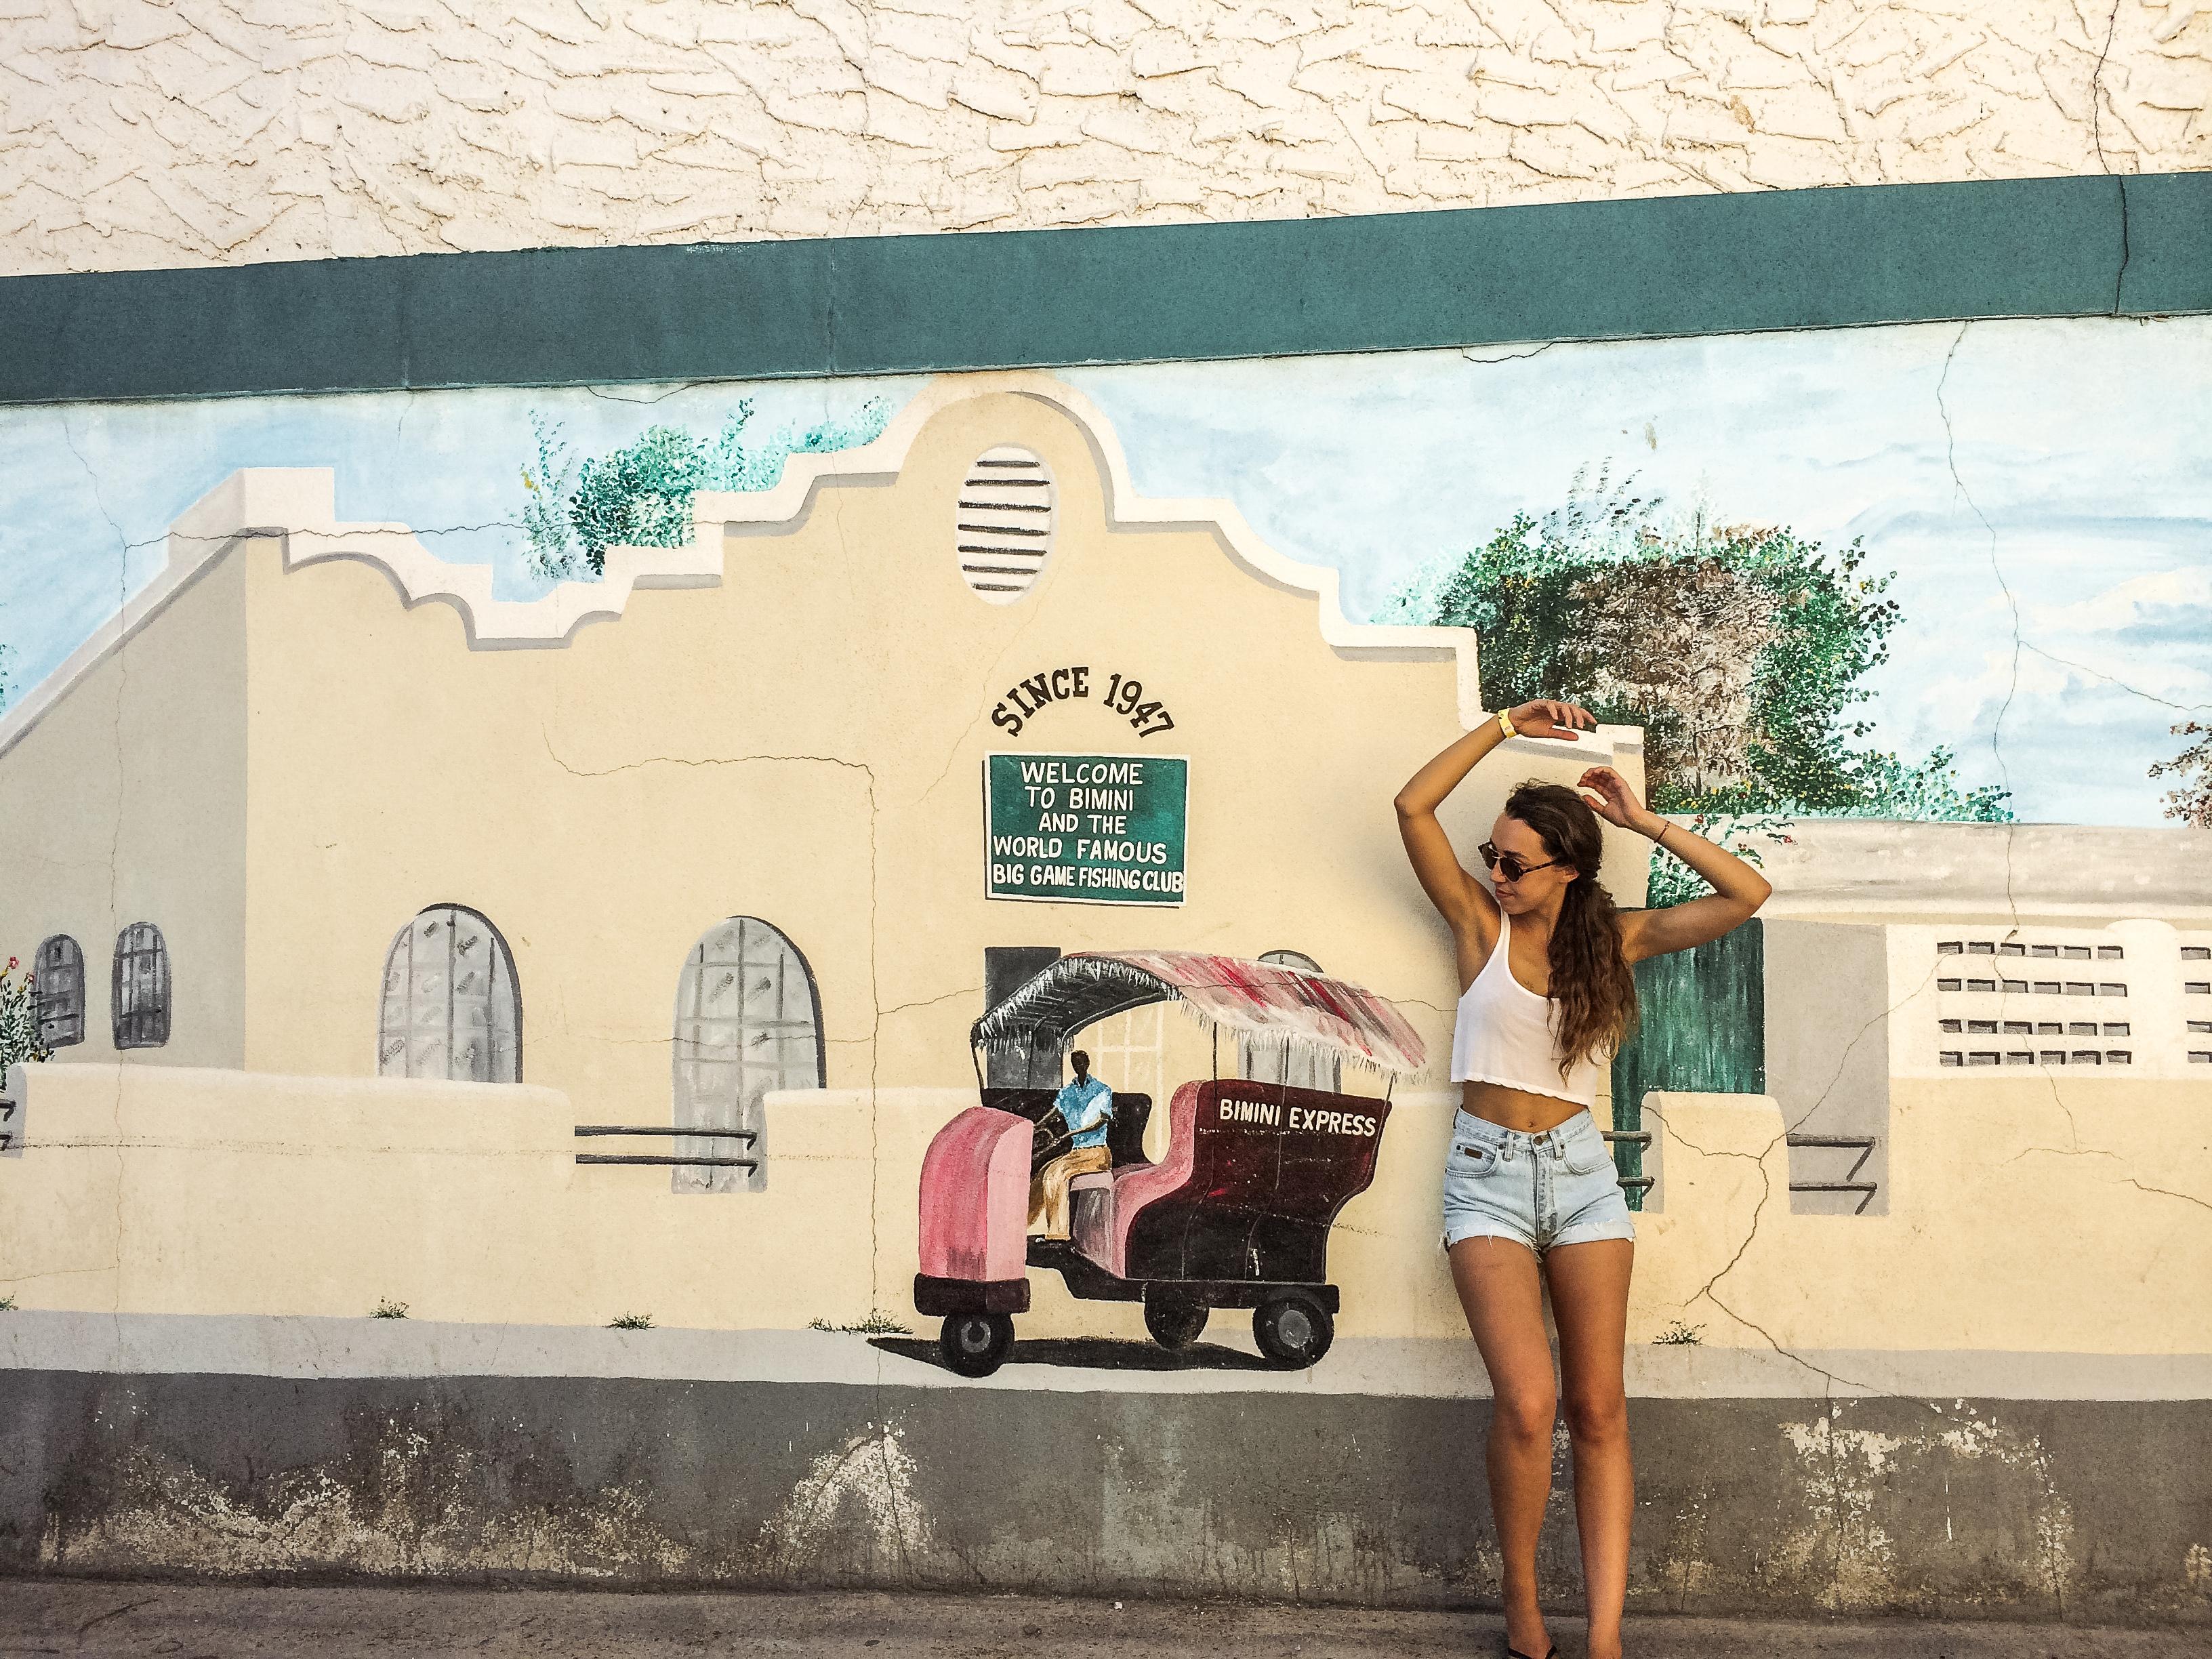 Strolling around Bimini